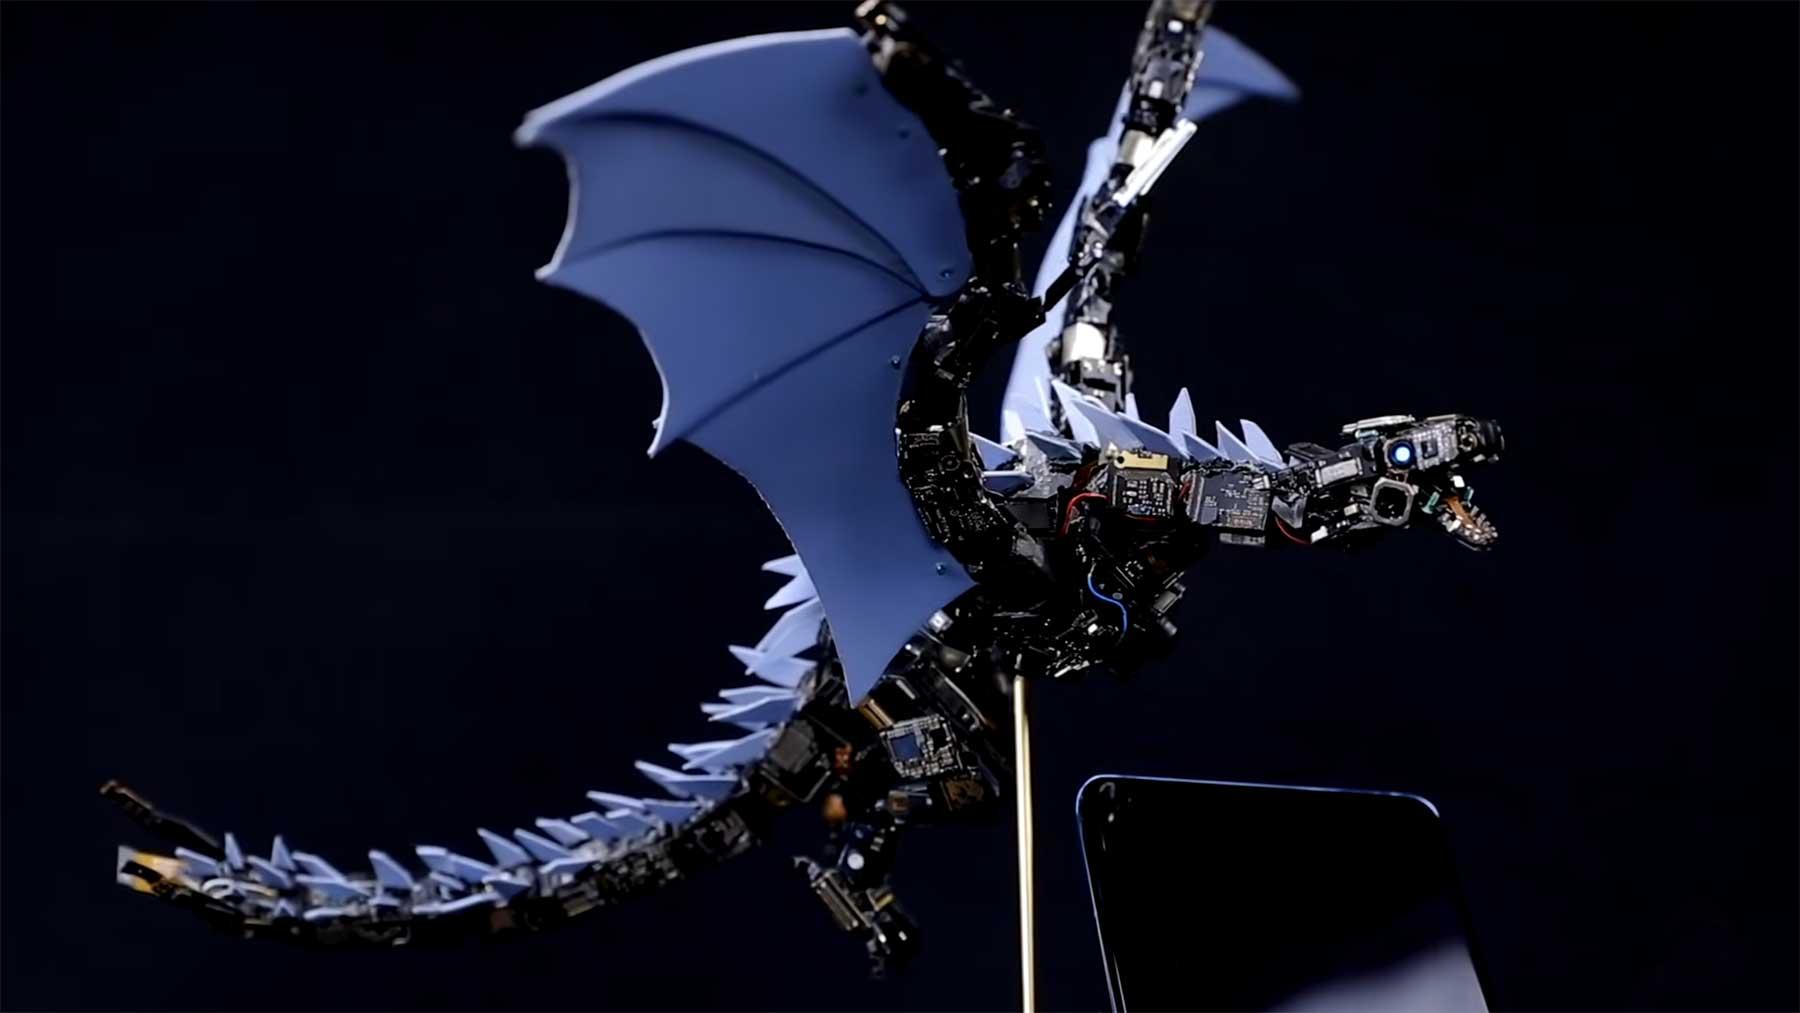 Drachenskulptur aus Smartphone-Teilen gefertigt drachenskulptur